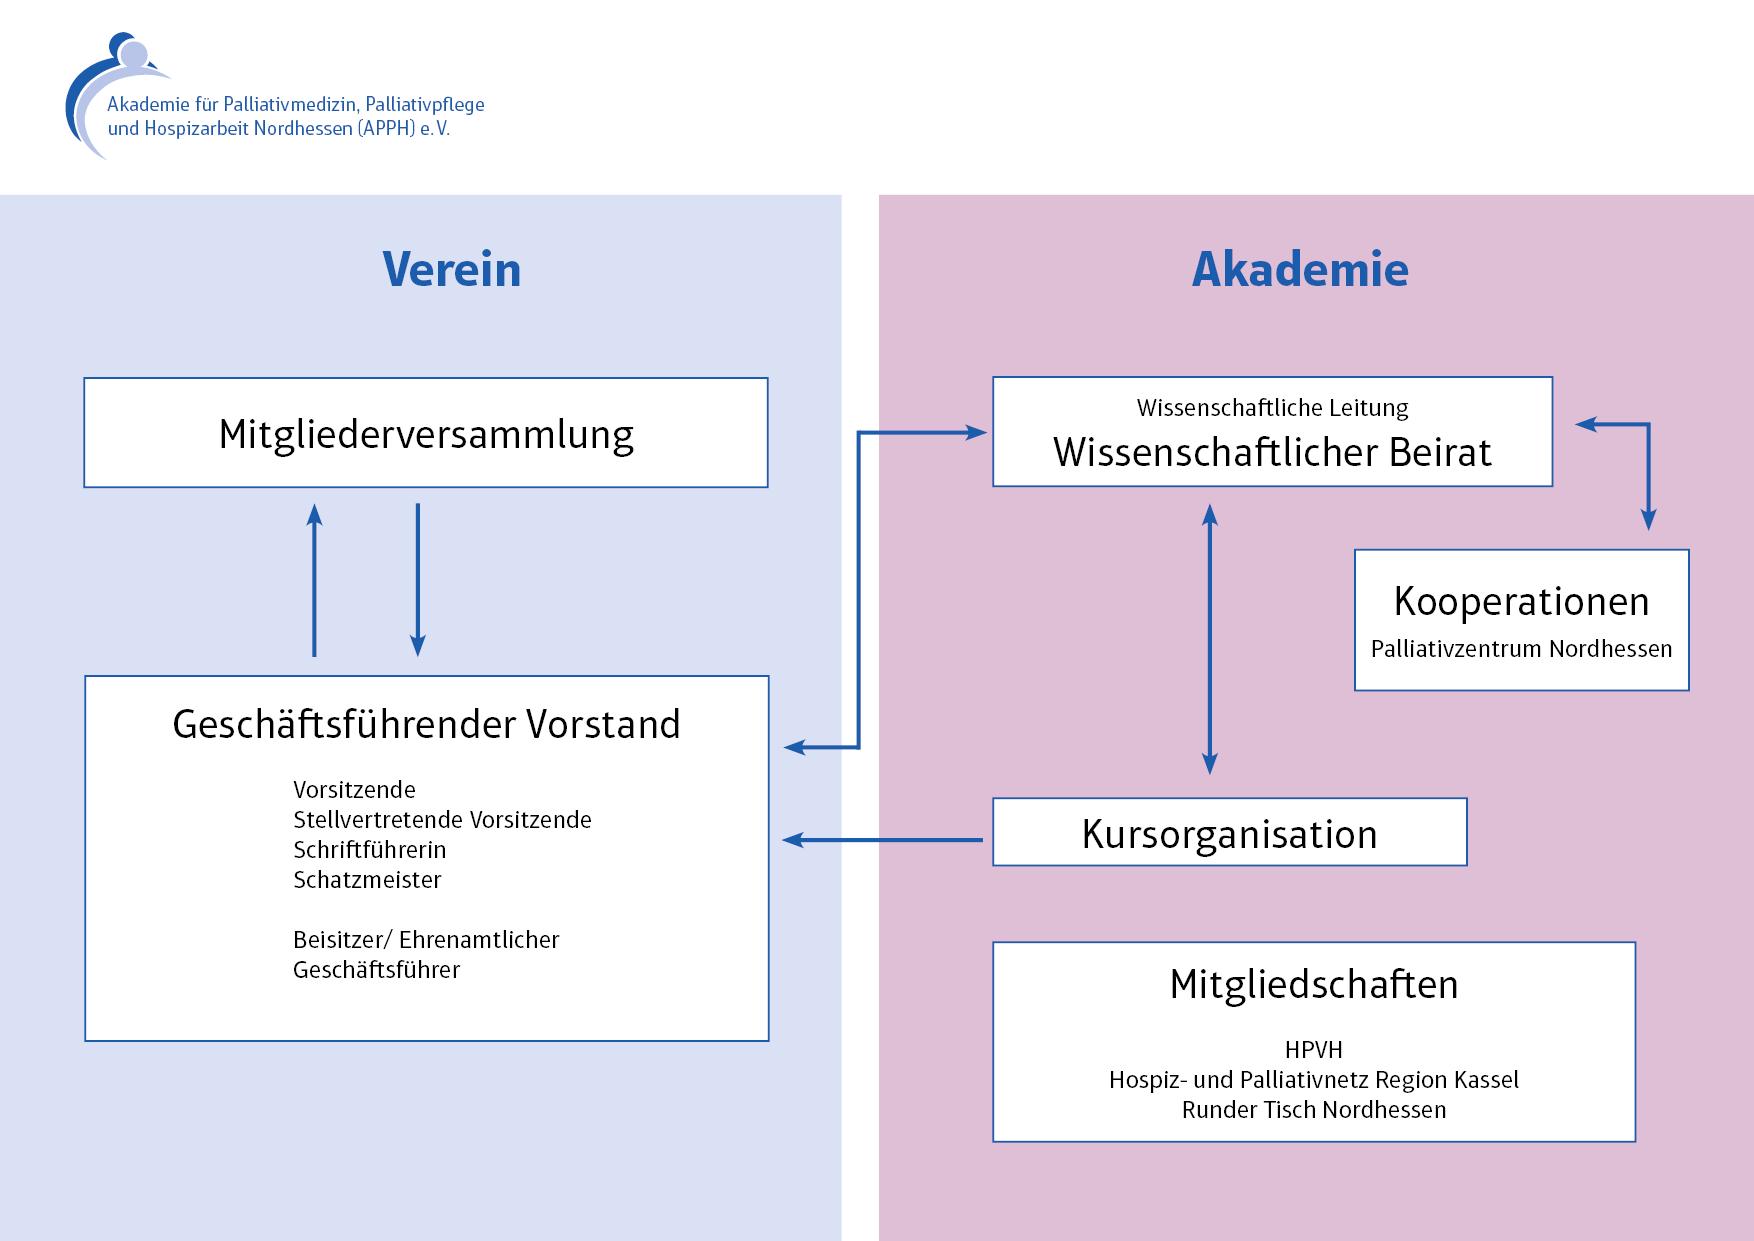 Organigramm APPH Nordhessen